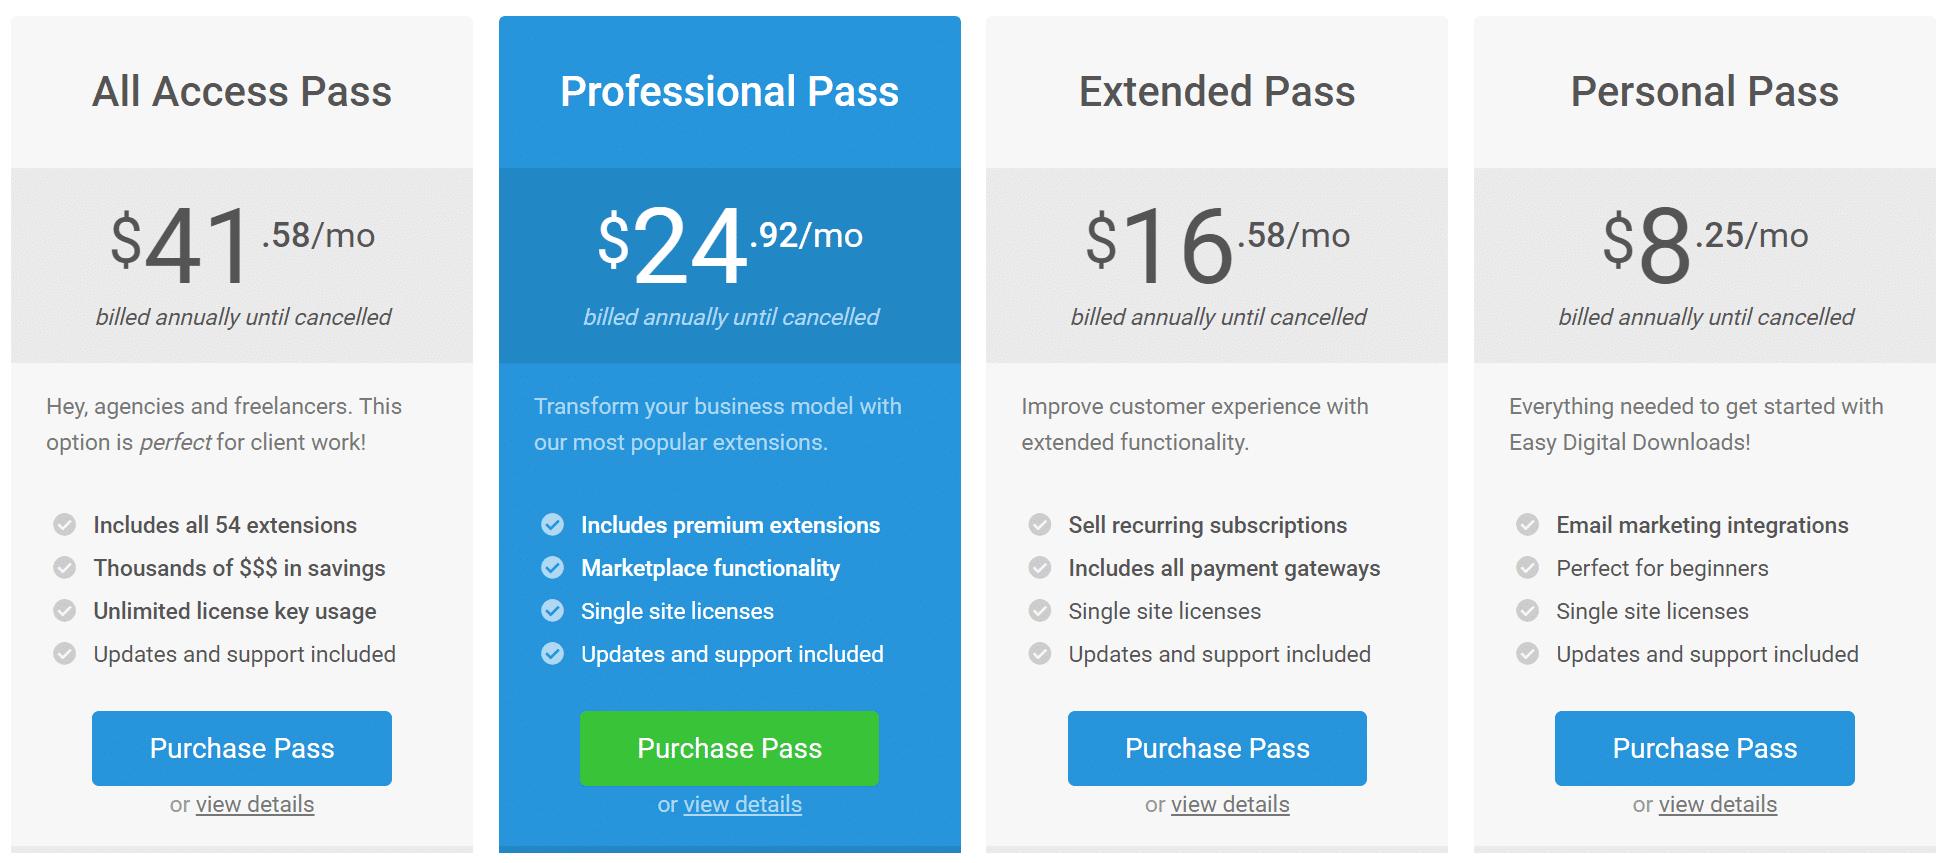 Easy Digital Downloads bundles